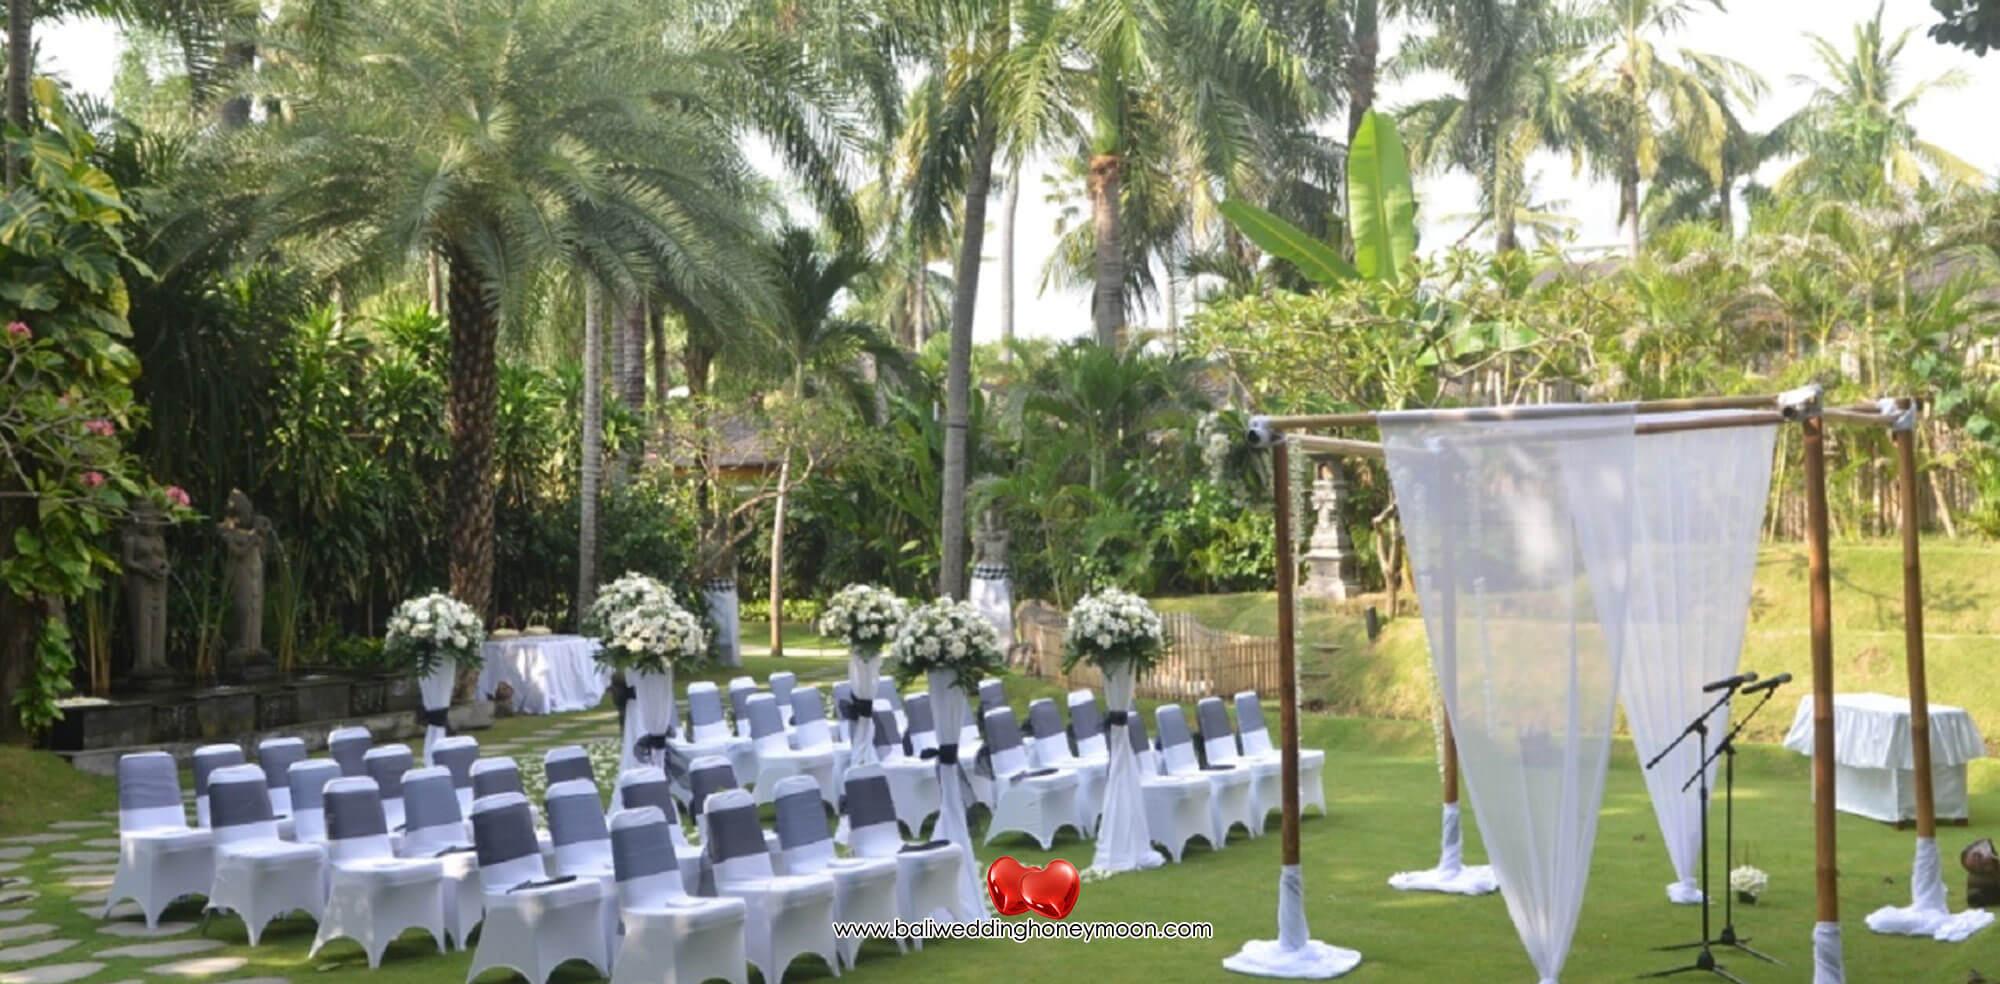 What Should I Chose: Wedding Planners? Wedding Coordinartor? or Wedding Designer?